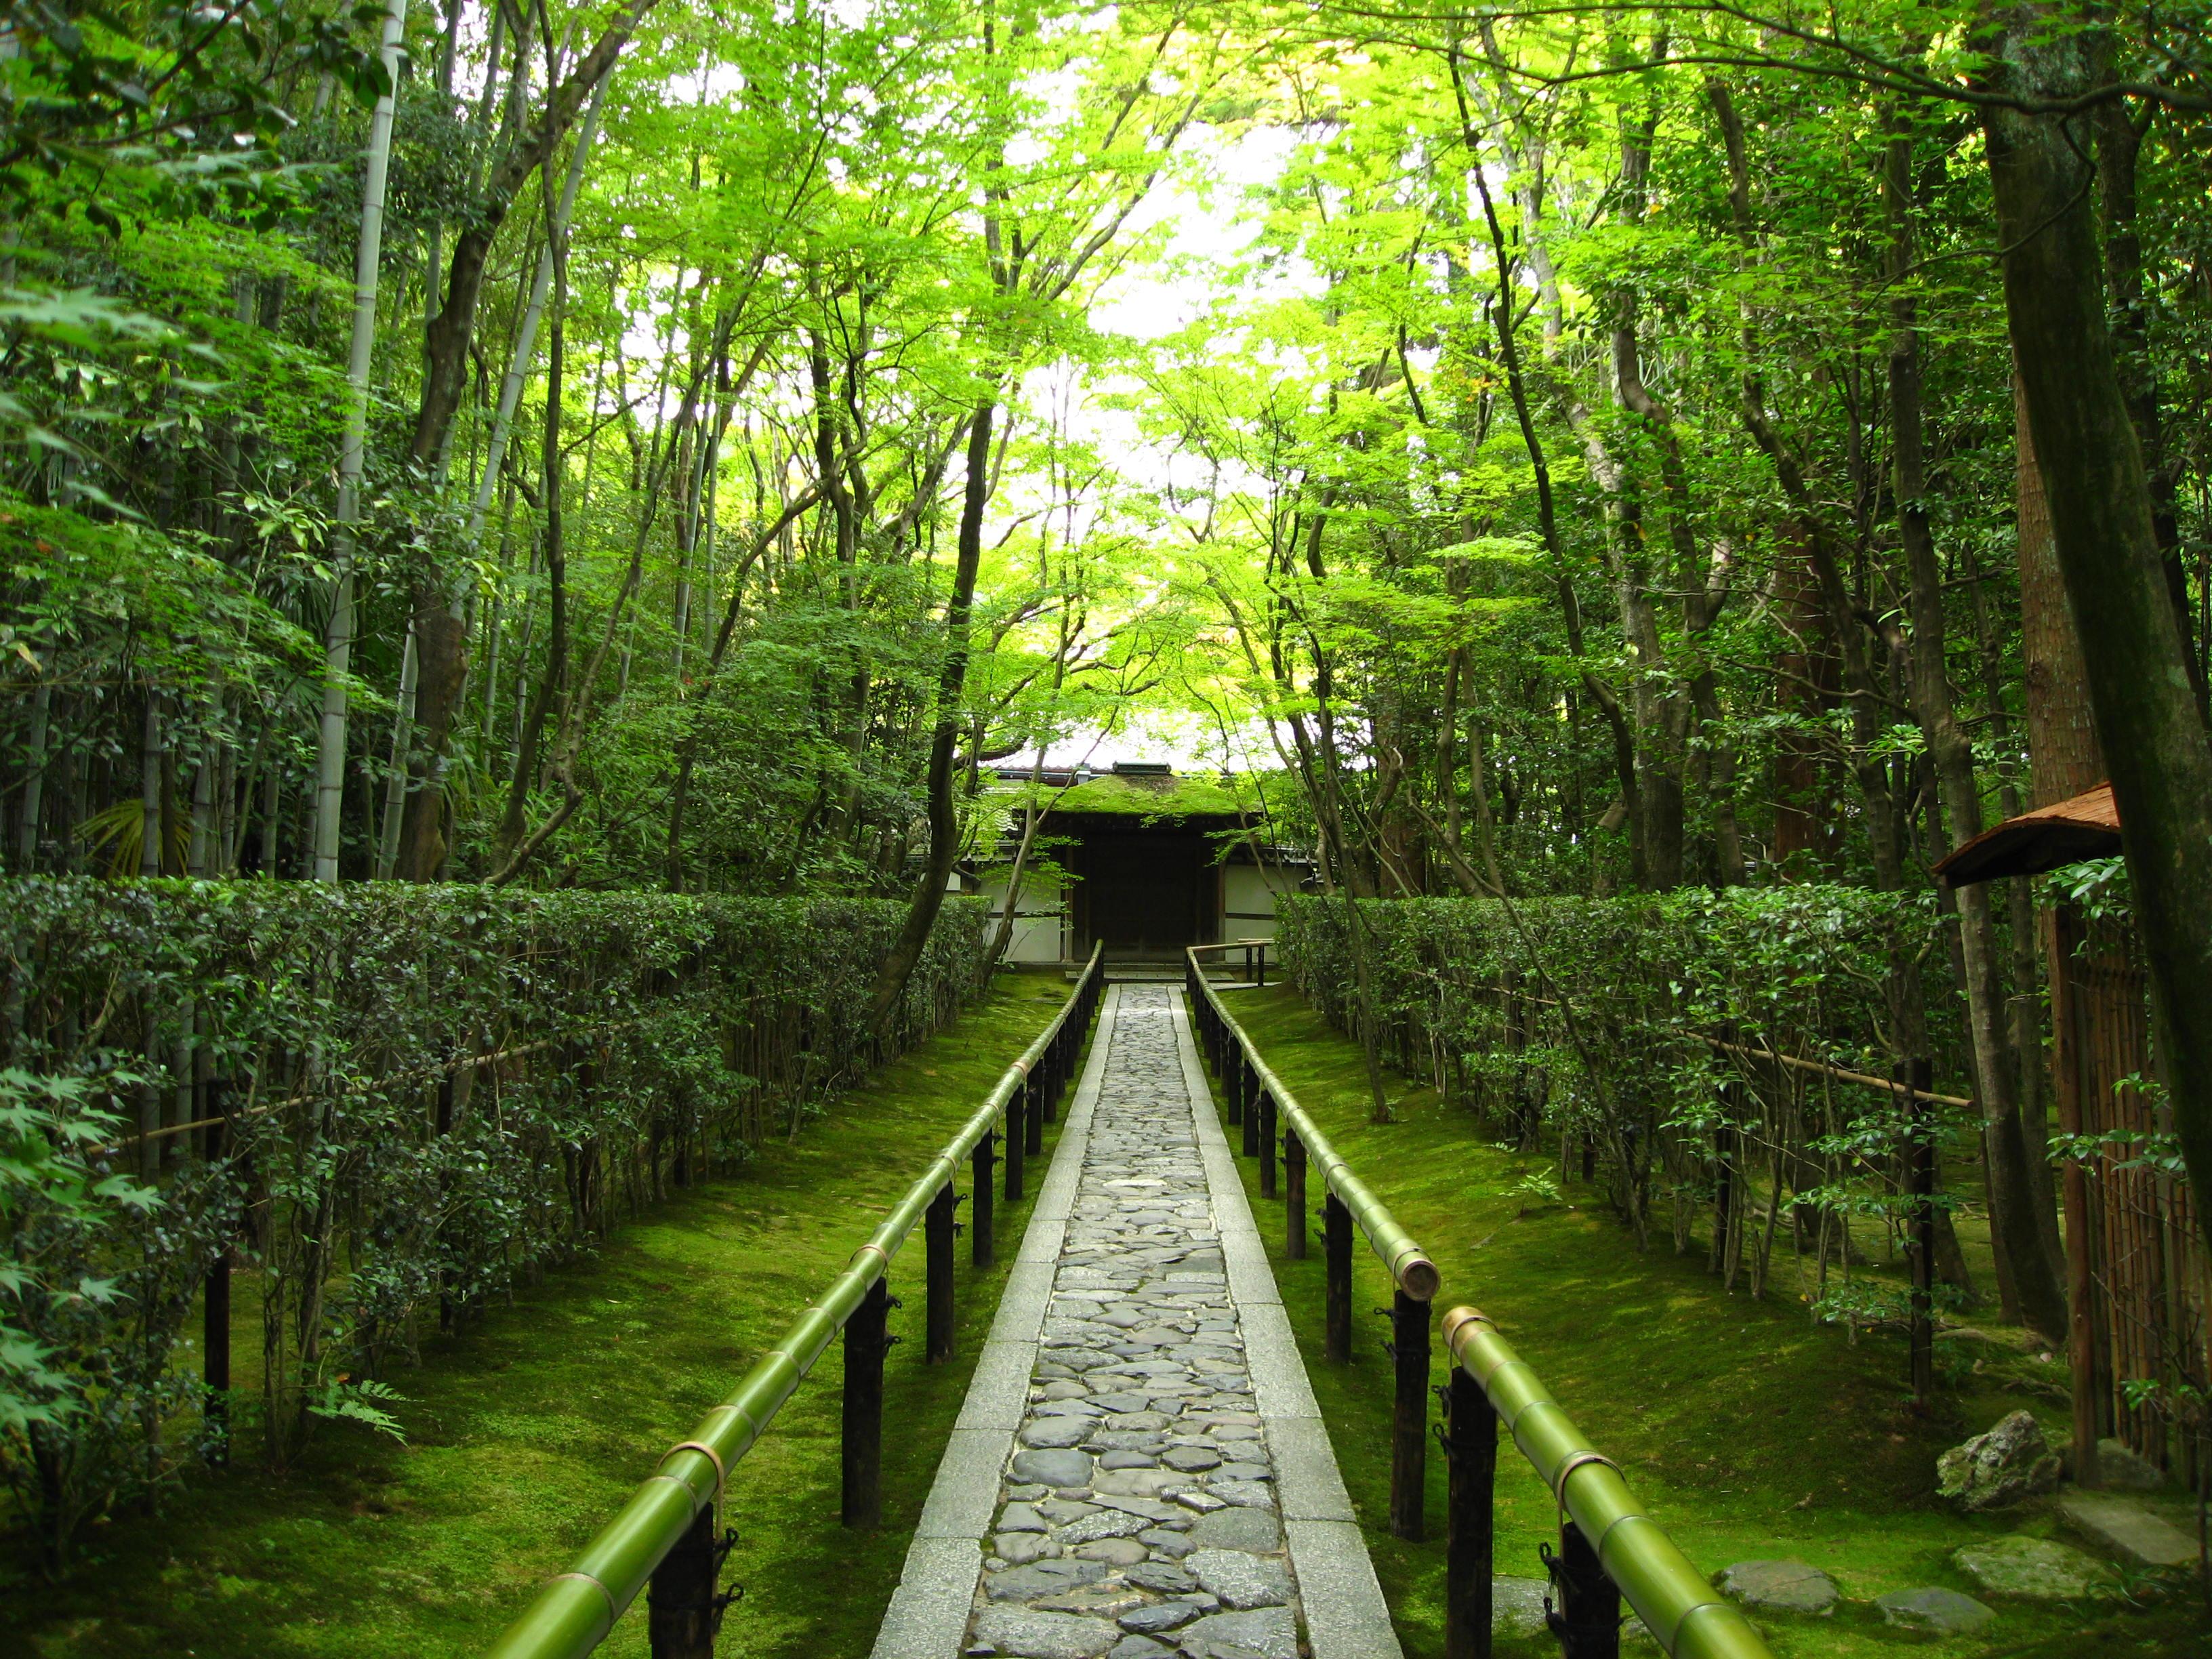 Bamboo forest entrance to Daitoku-ji temple, Kyoto, Japan